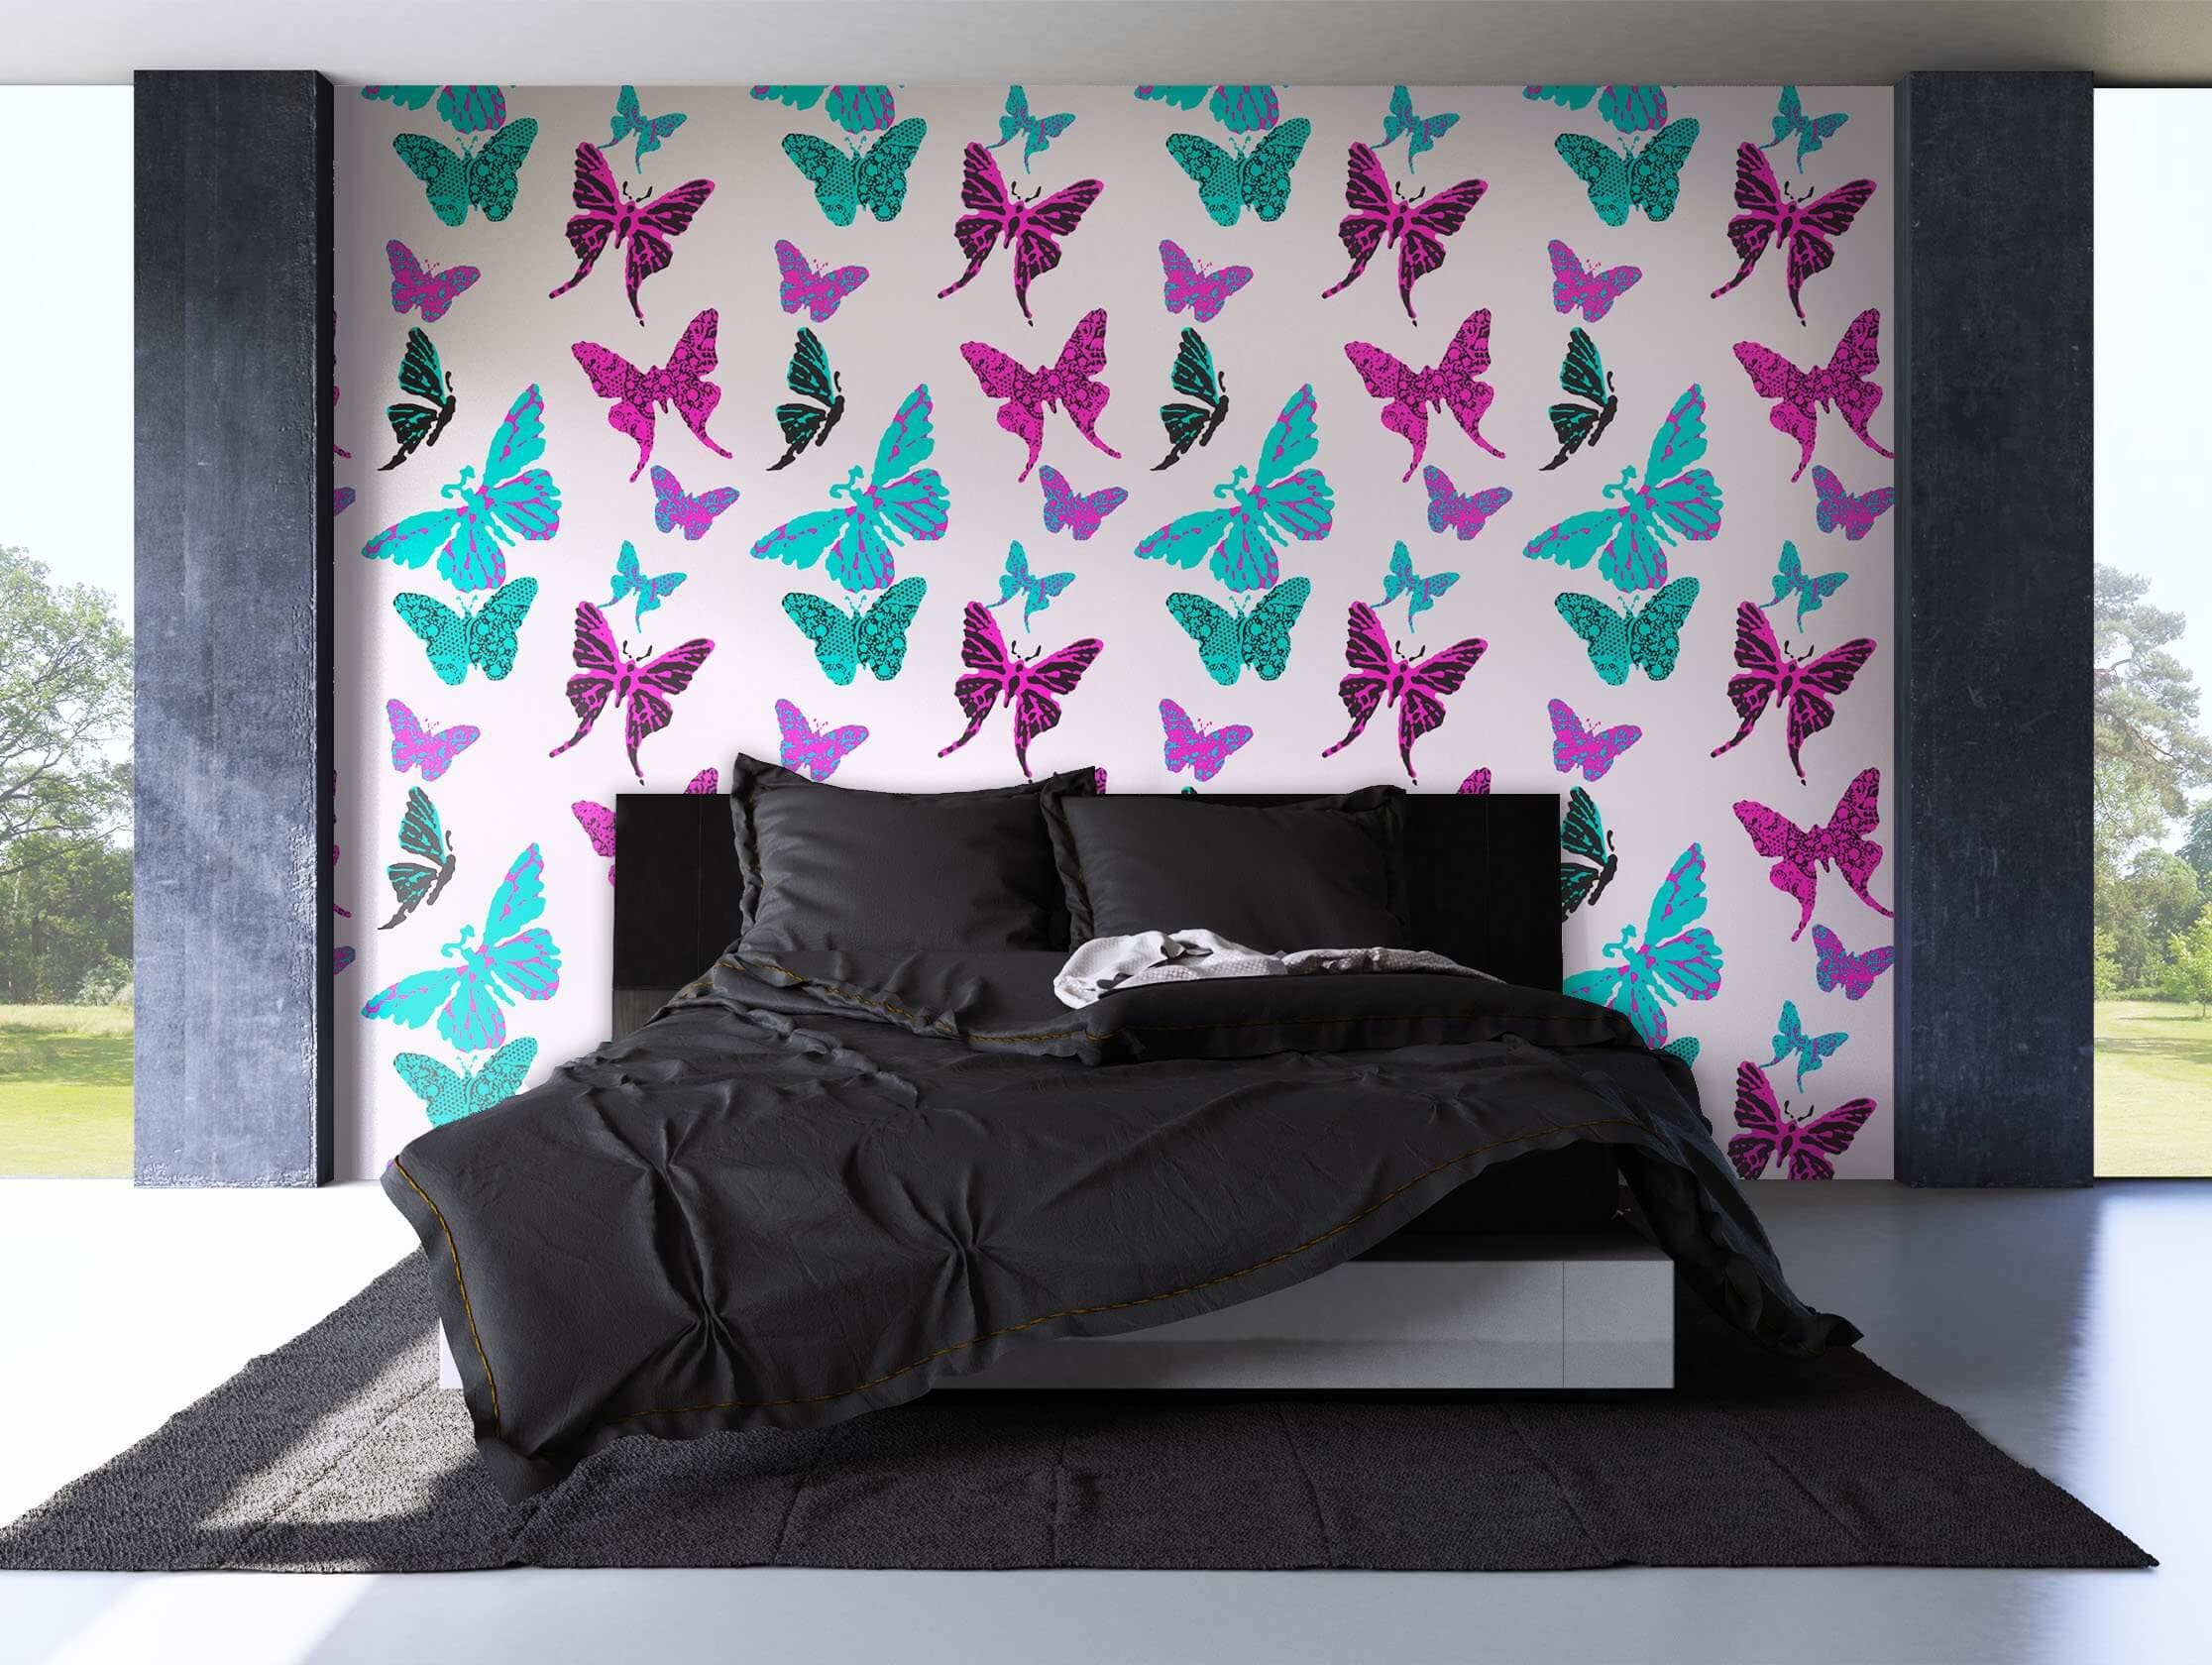 ... Tapete Schmetterlinge Dekoration Pink Rosa Lila Türkis Papillon Papillon